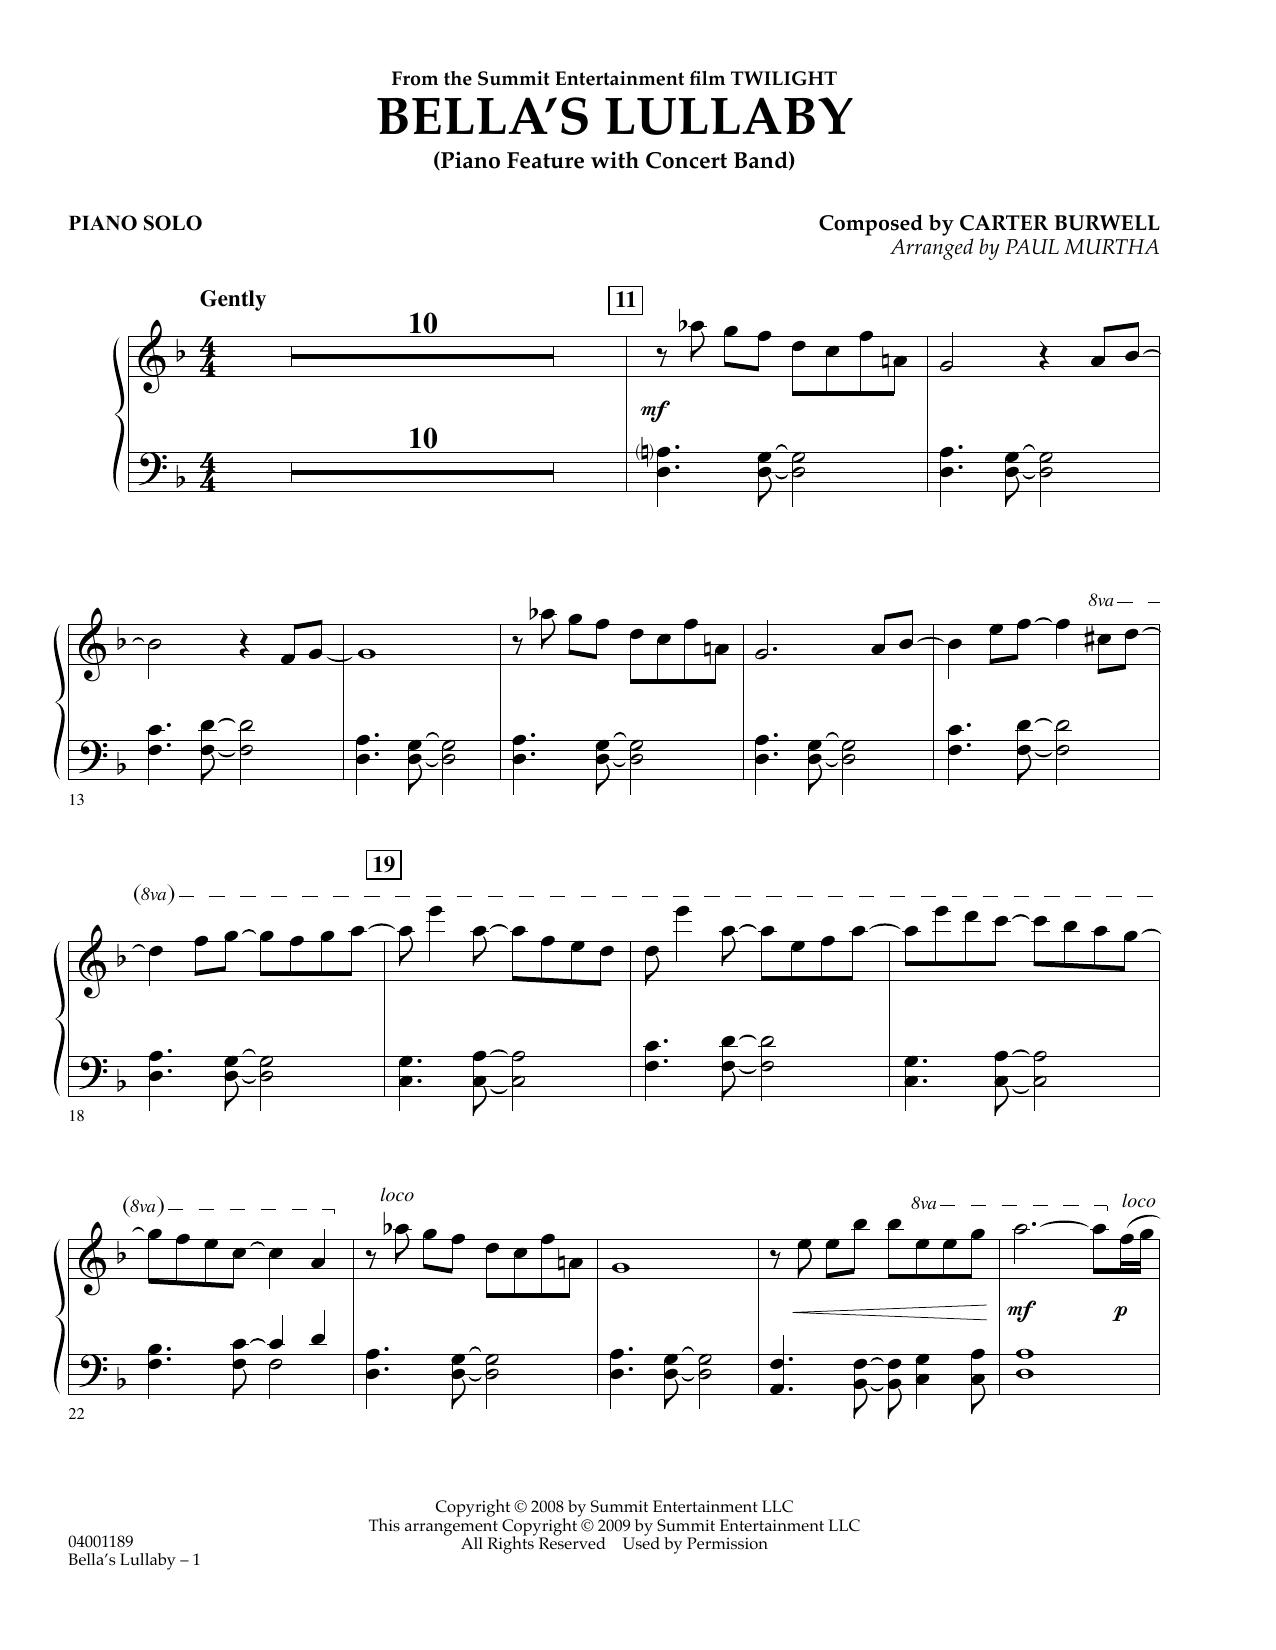 Bella's Lullaby Piano Music Sheet